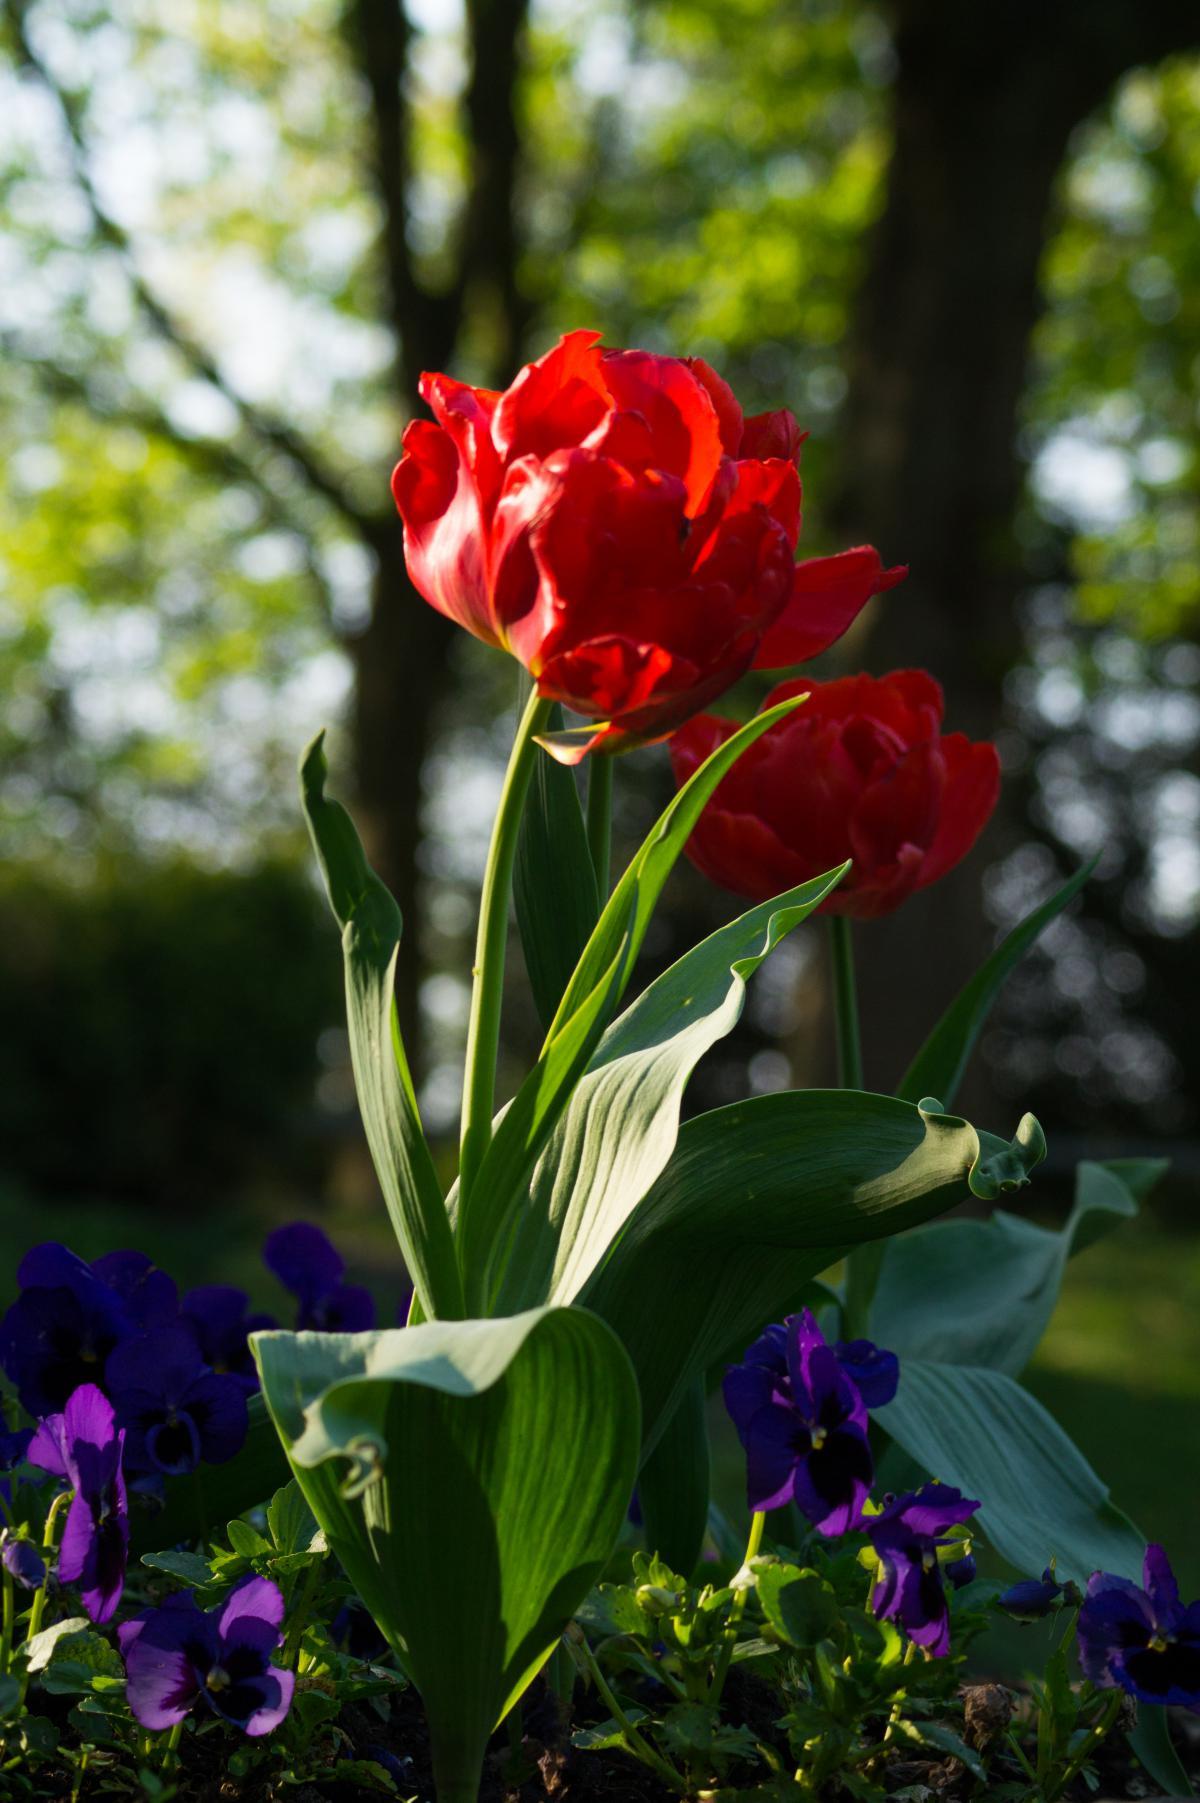 Fleurs de pivoine jardin #23701